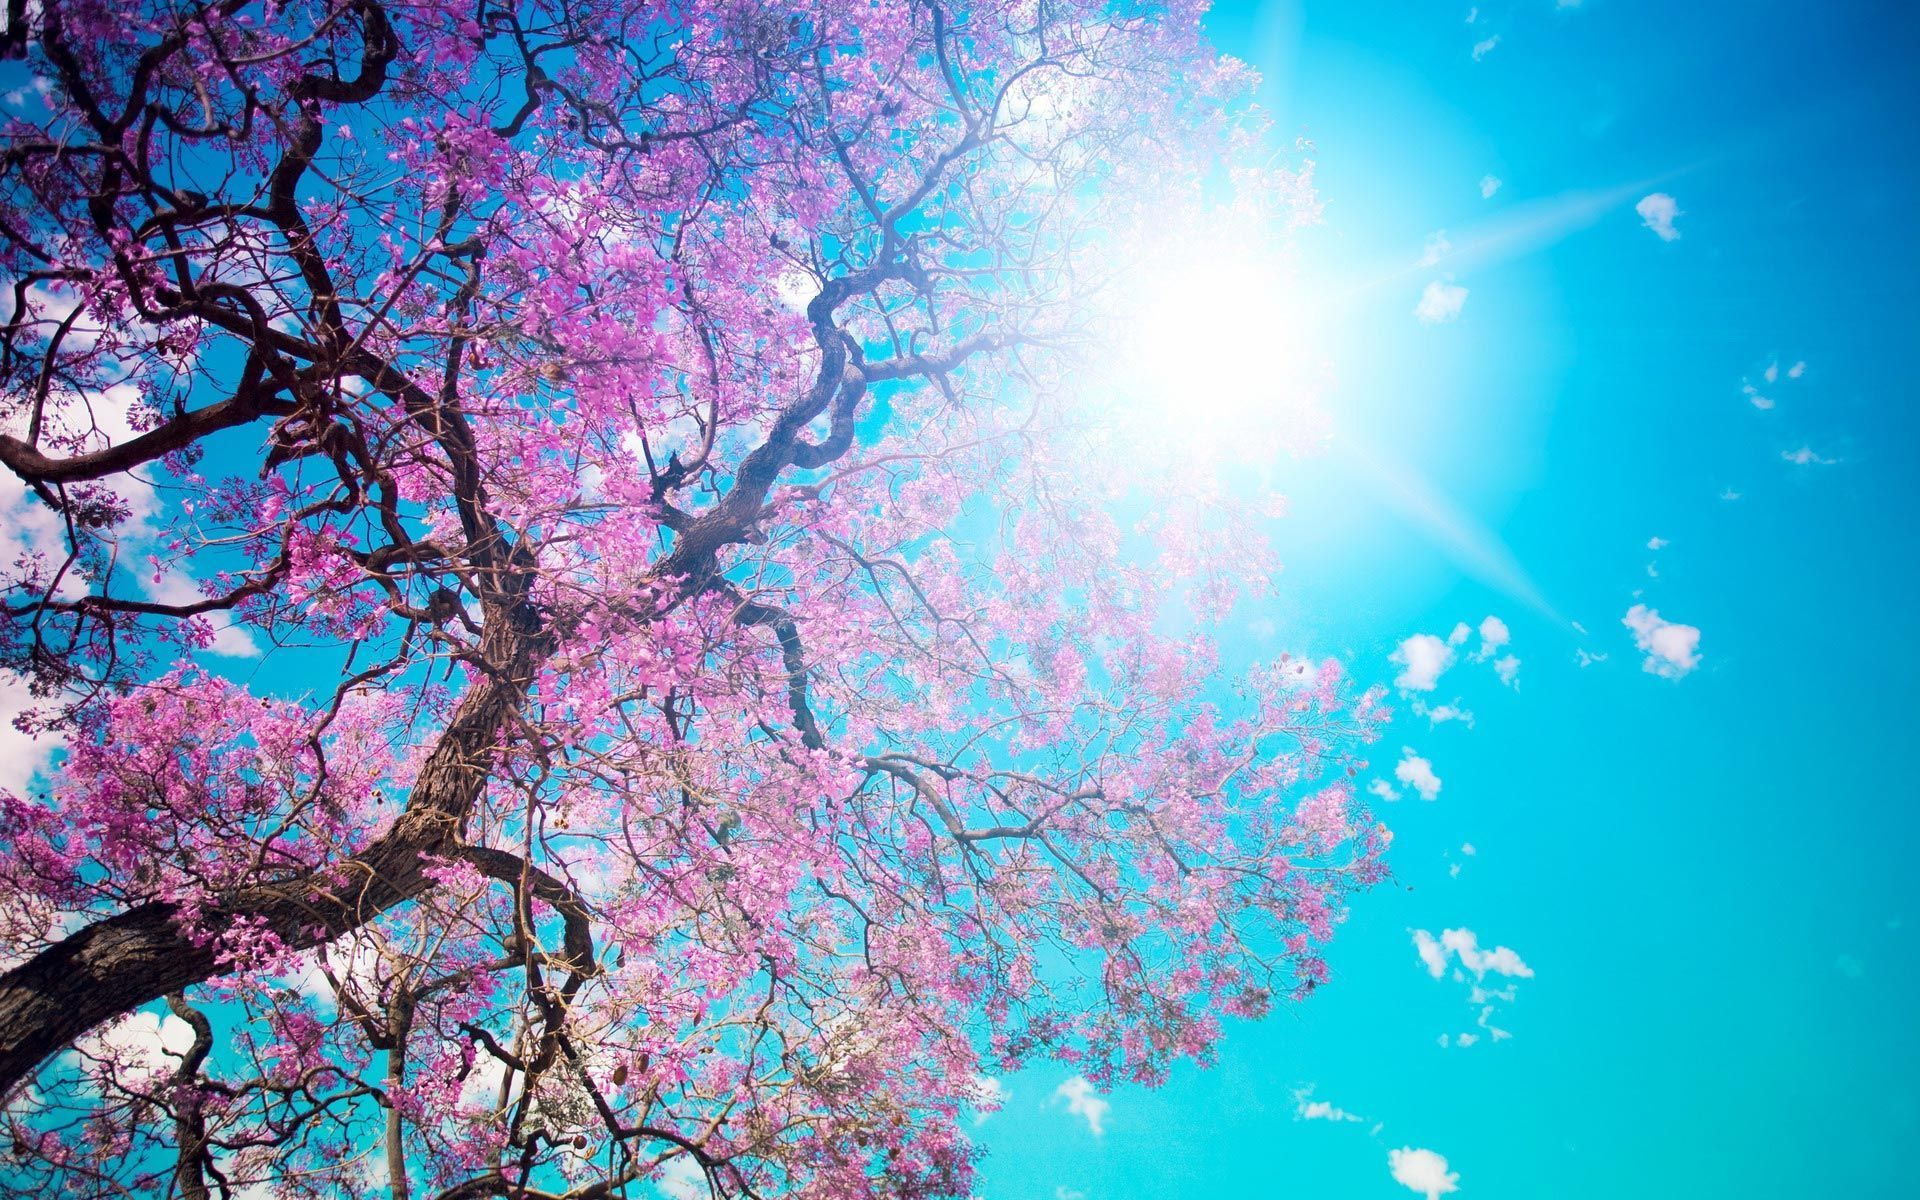 Spring Scenes Hd Wallpaper Desktop Beraplan Spring Wallpaper Cherry Blossom Wallpaper Spring Pictures